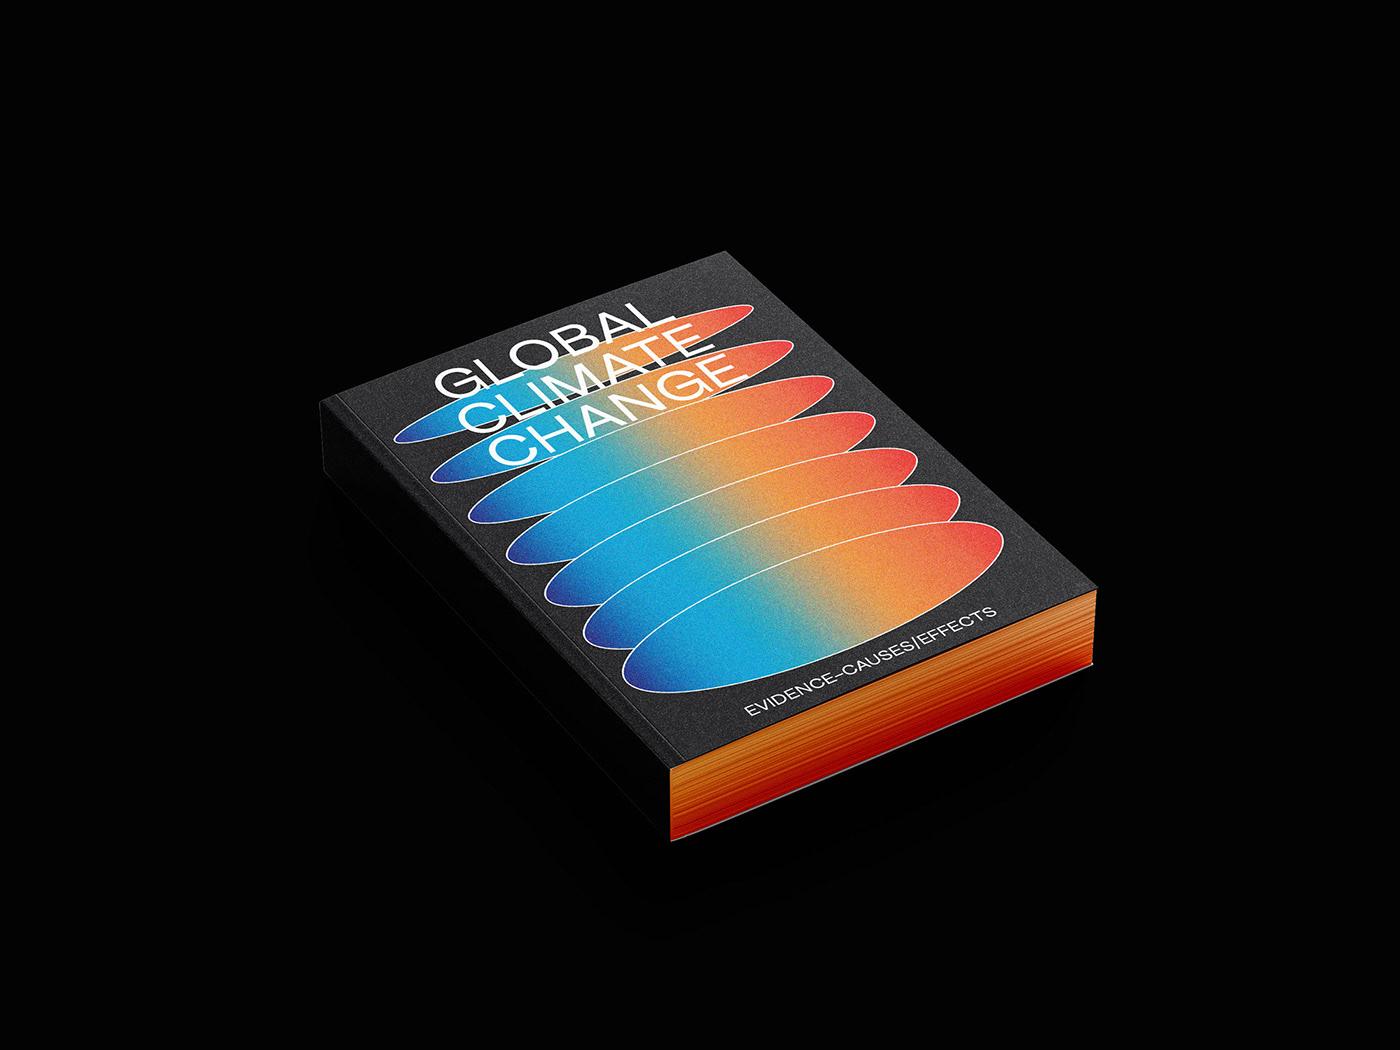 book change climate editorial Global global warming nasa Nature print world